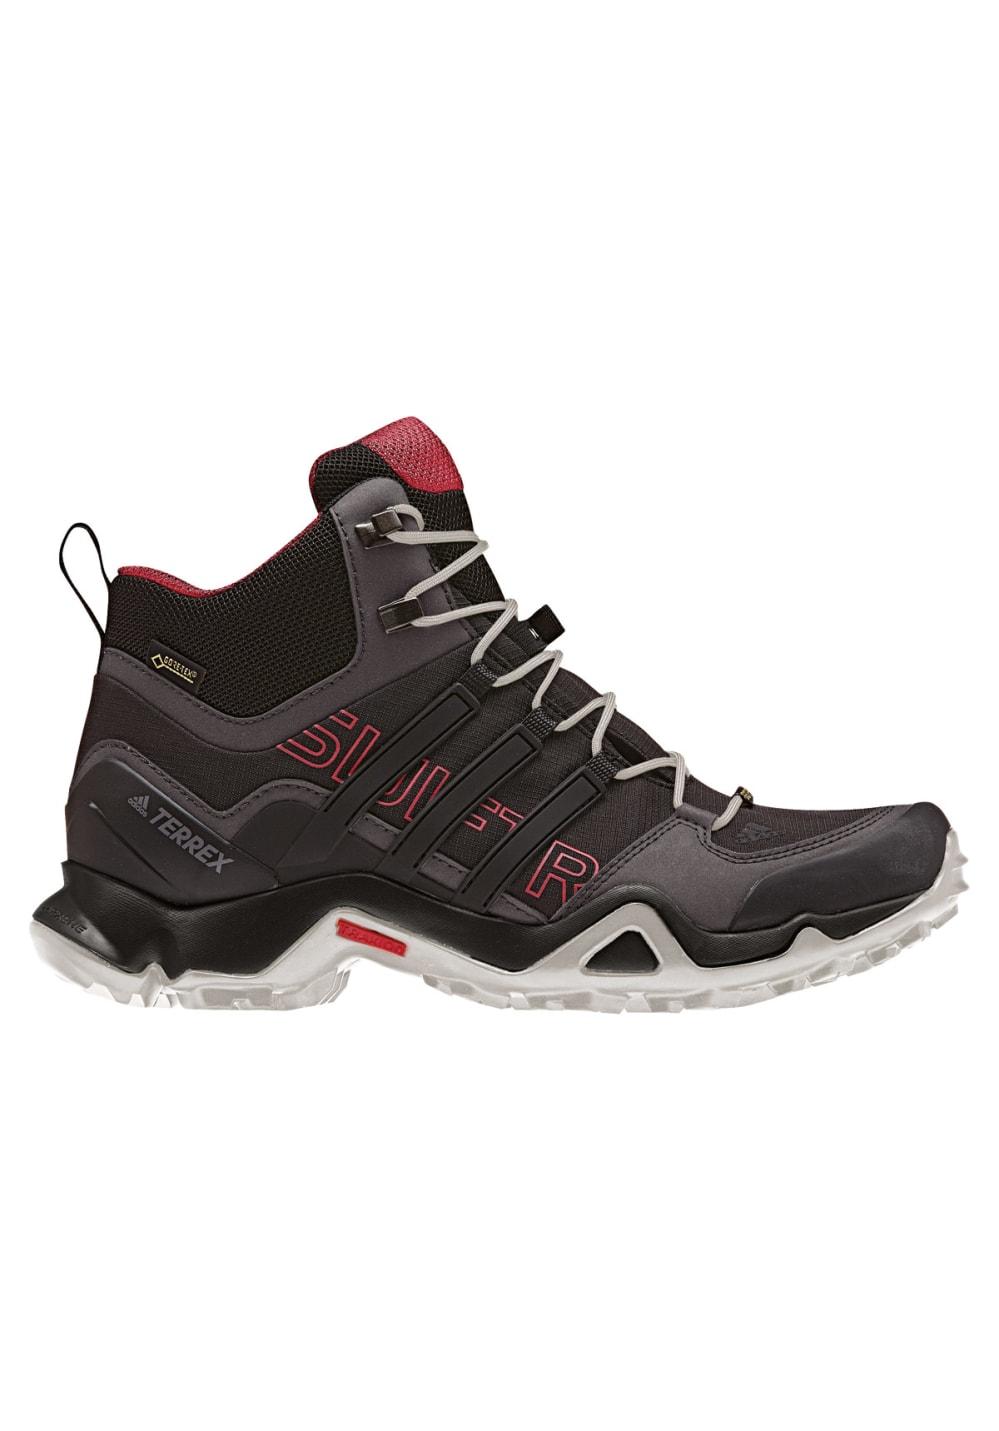 2d21a249b48 adidas Terrex Swift R Mid GTX - Outdoor shoes for Women - Black